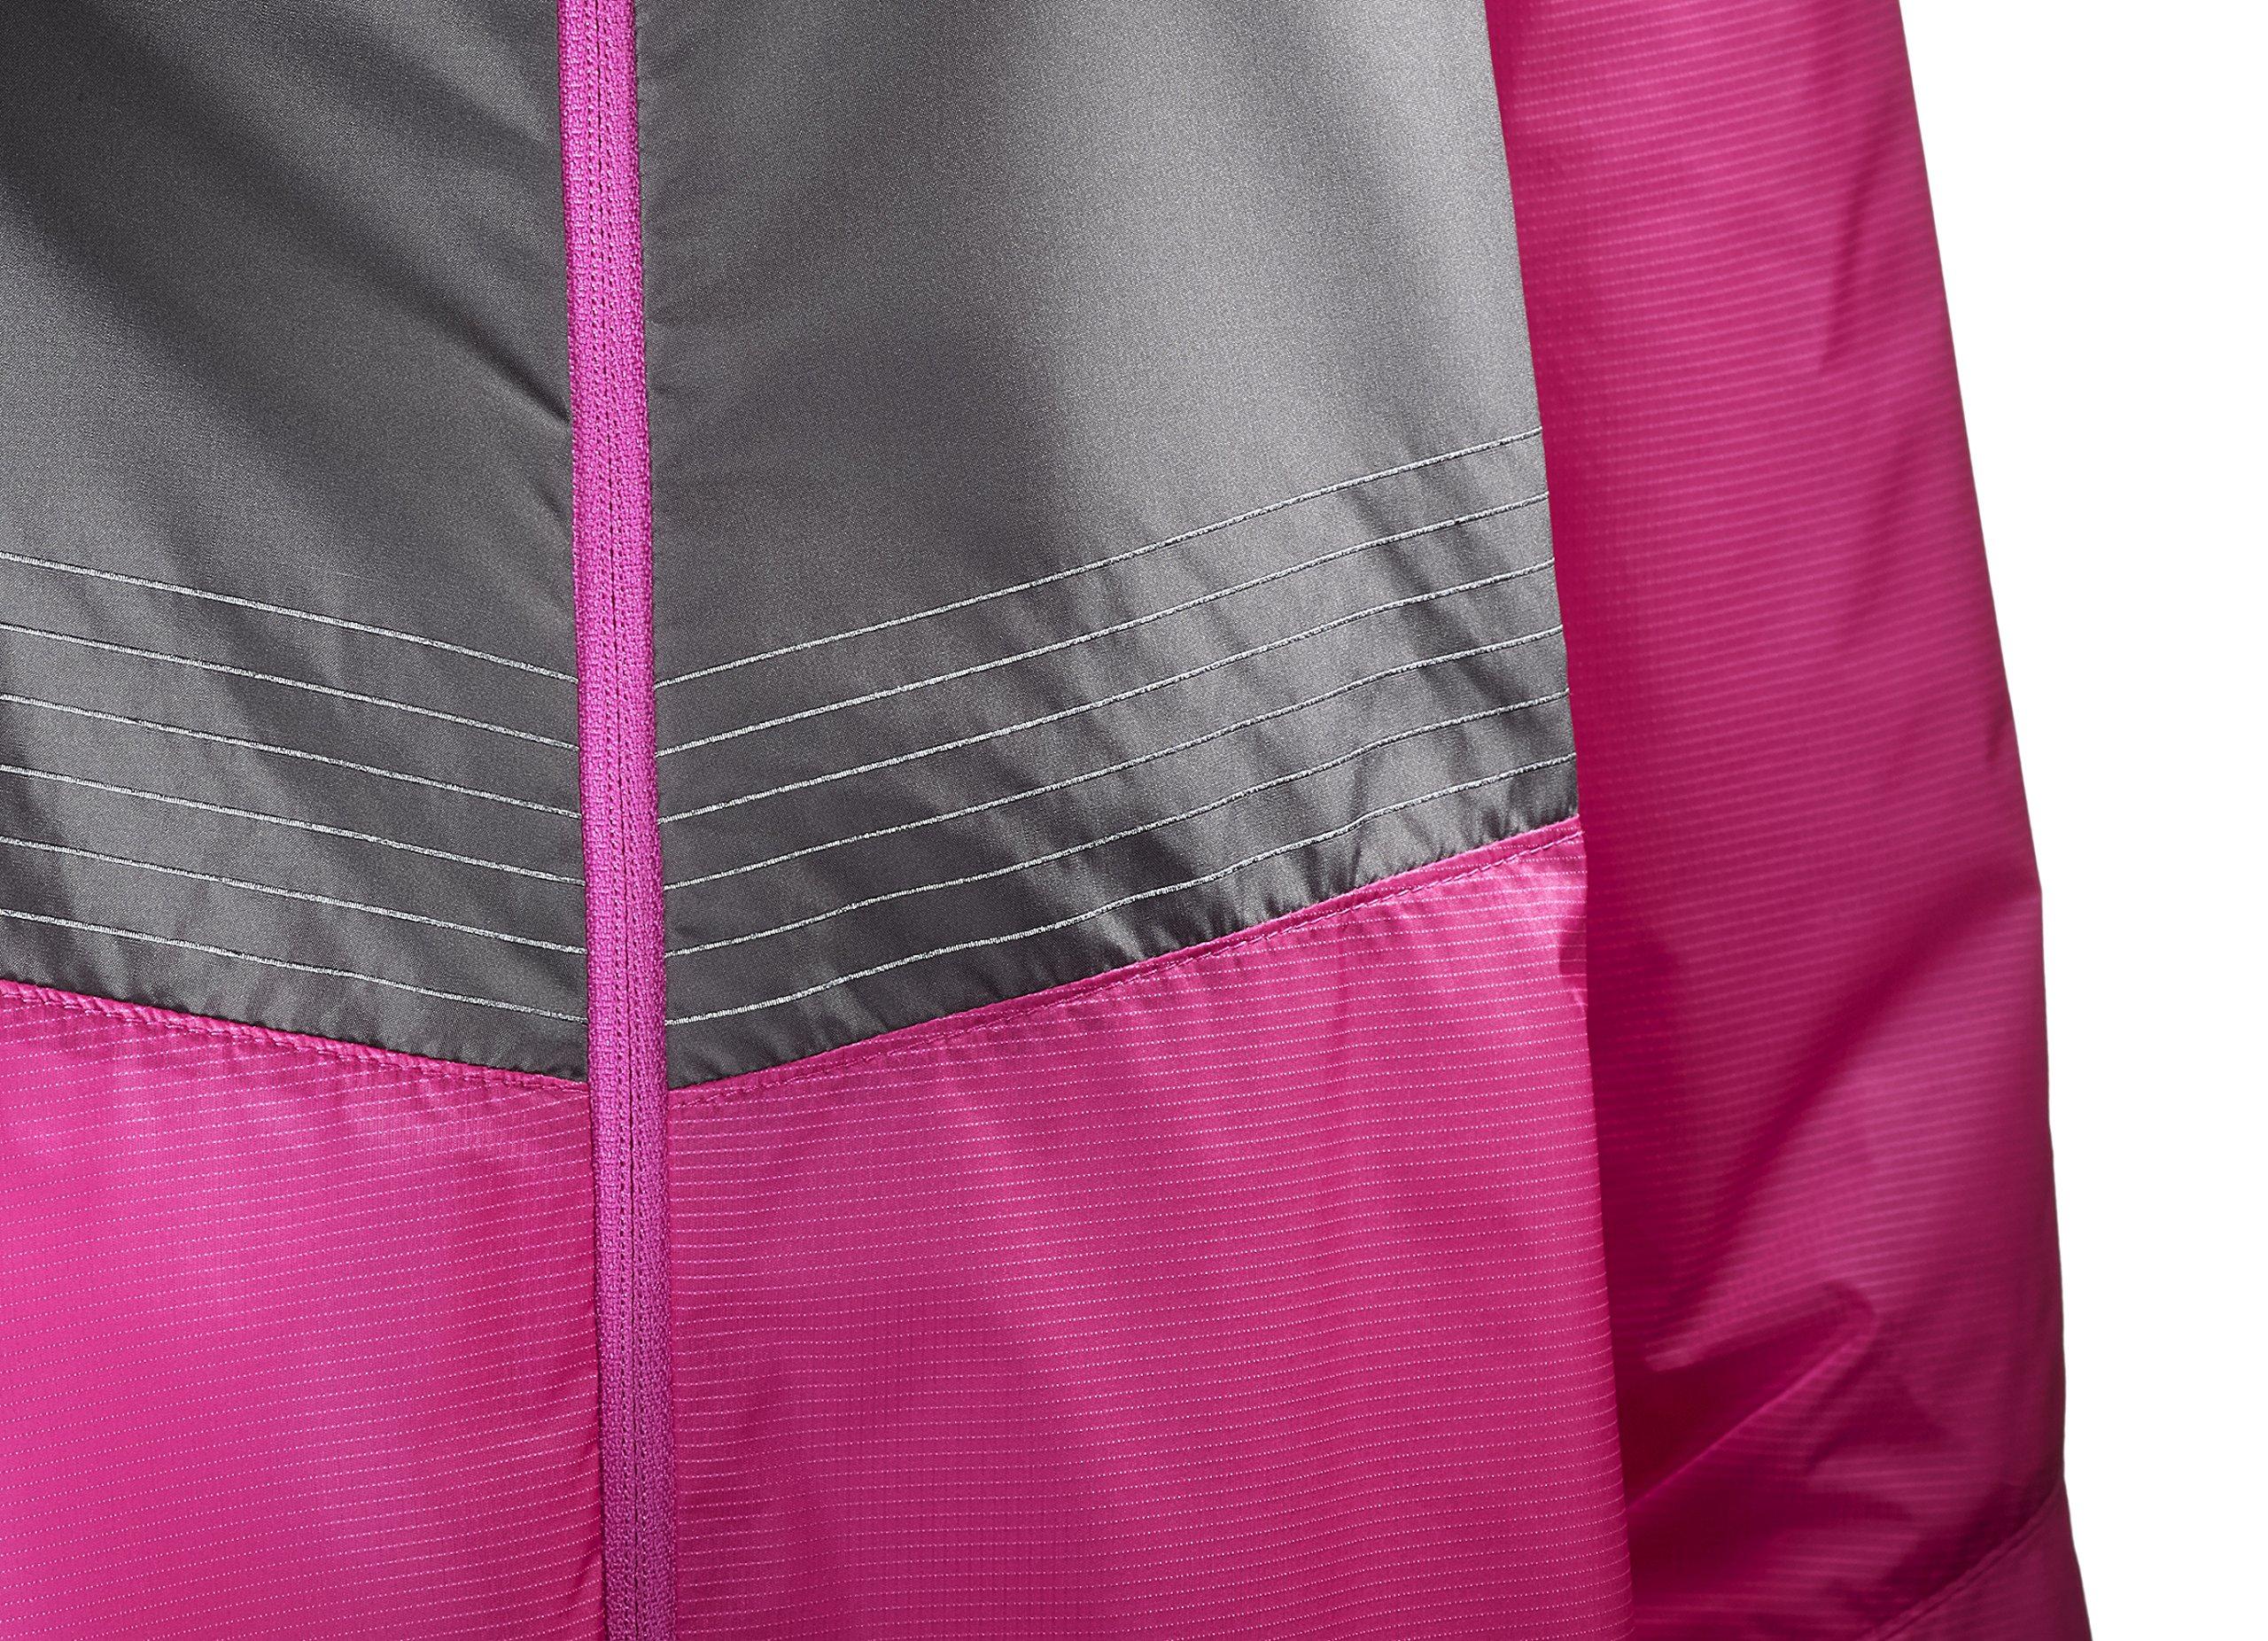 Salomon Women's Lightning Aero FZ Hoodie, Pink Yarrow, S by Salomon (Image #5)